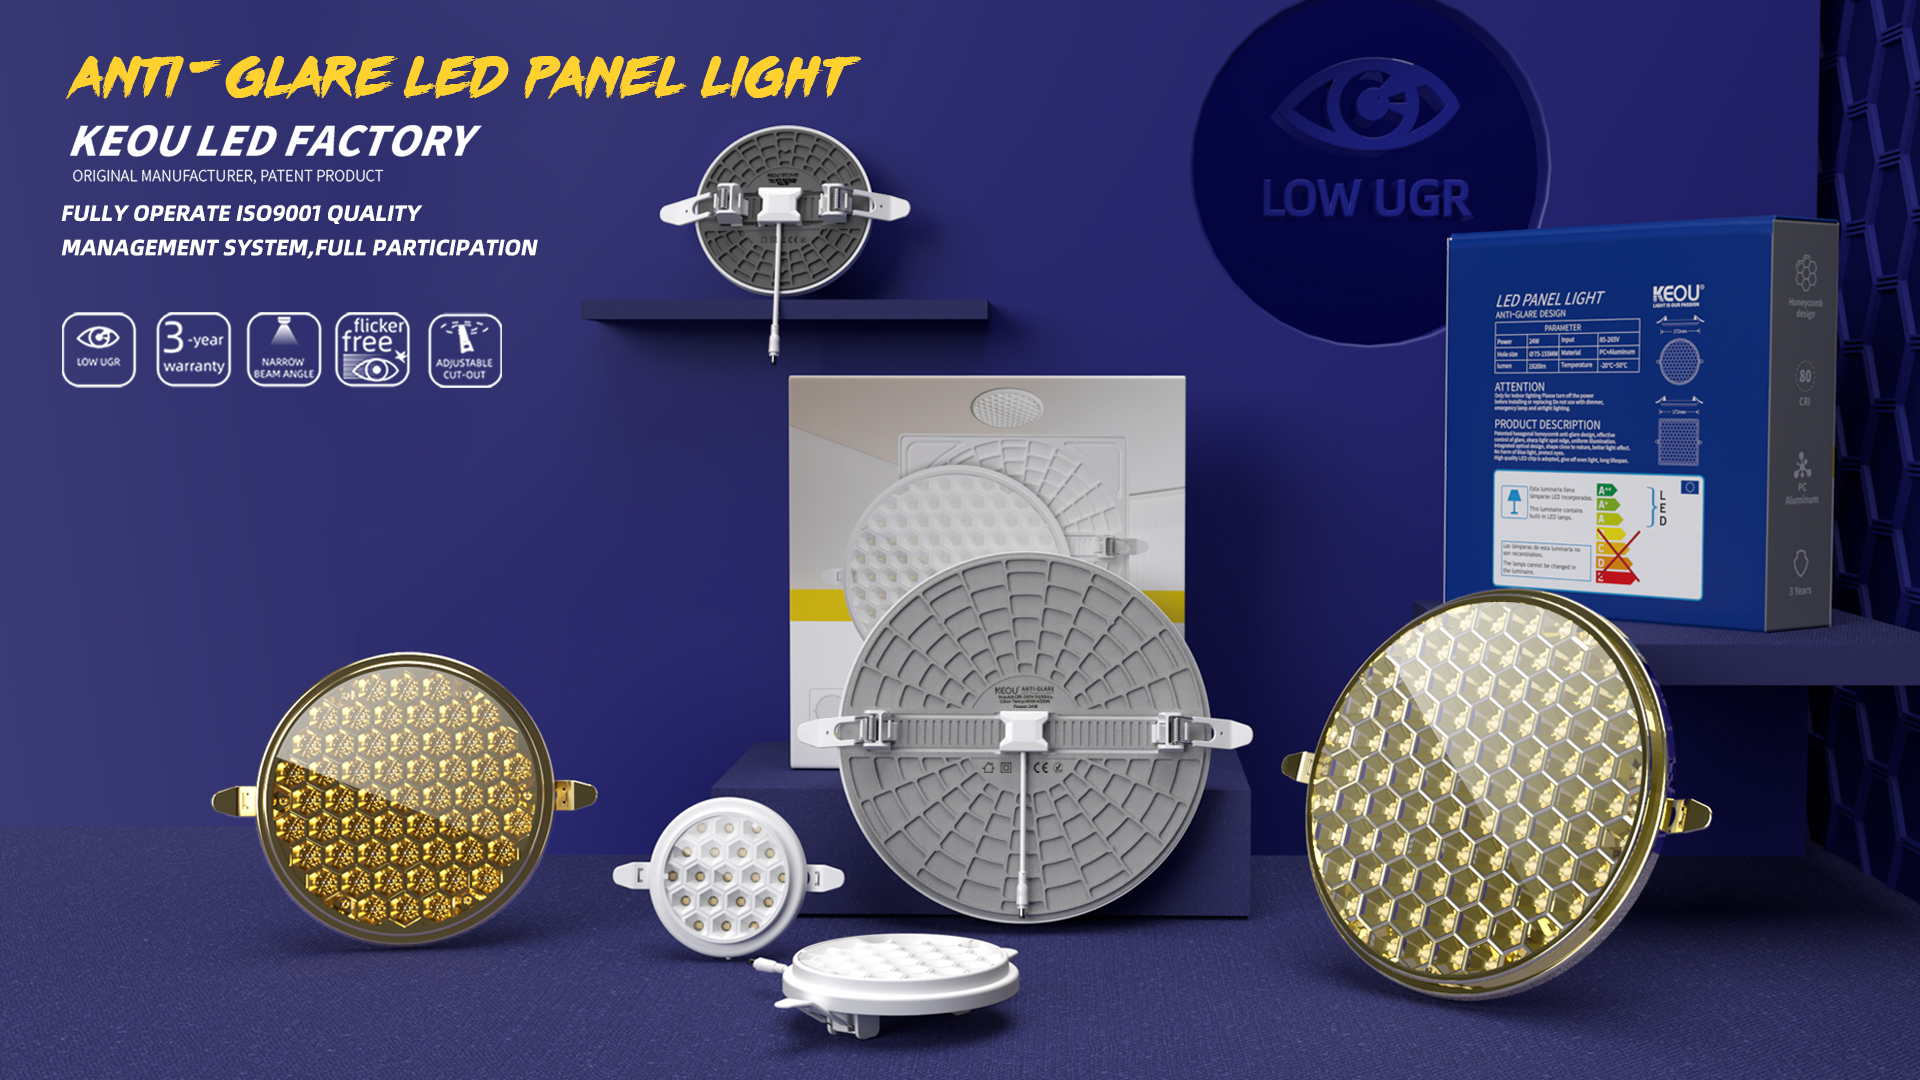 Anti Glare LED Panel Factory- KEOU New Arrival